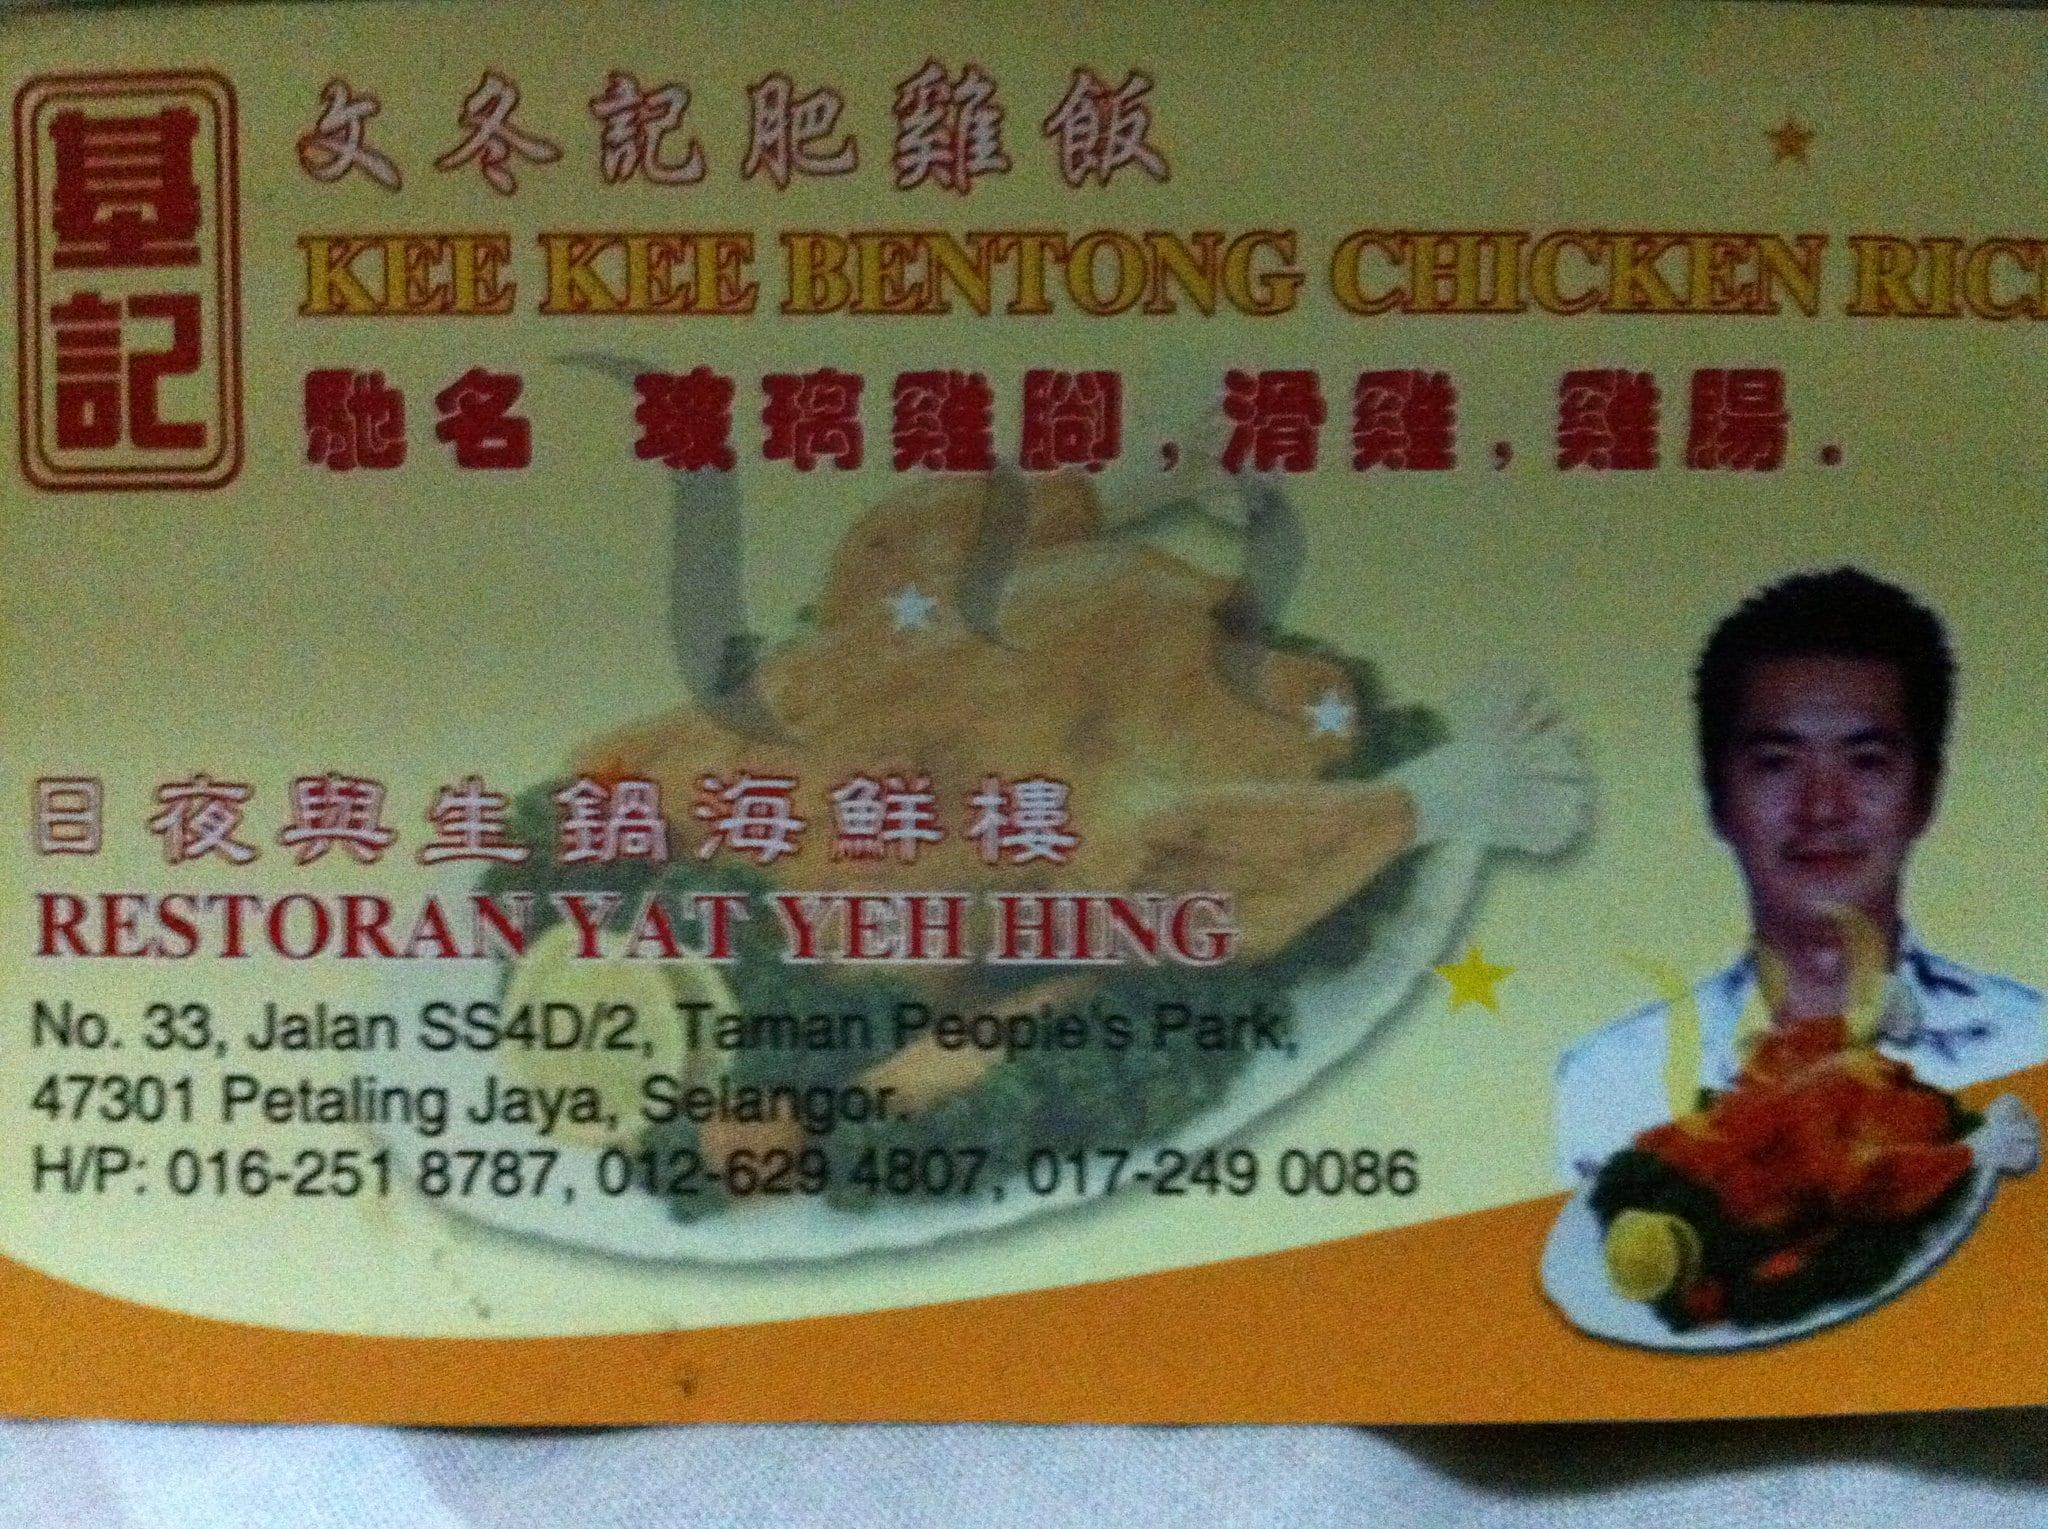 Kee Kee Bentong Chicken Rice @ PJ